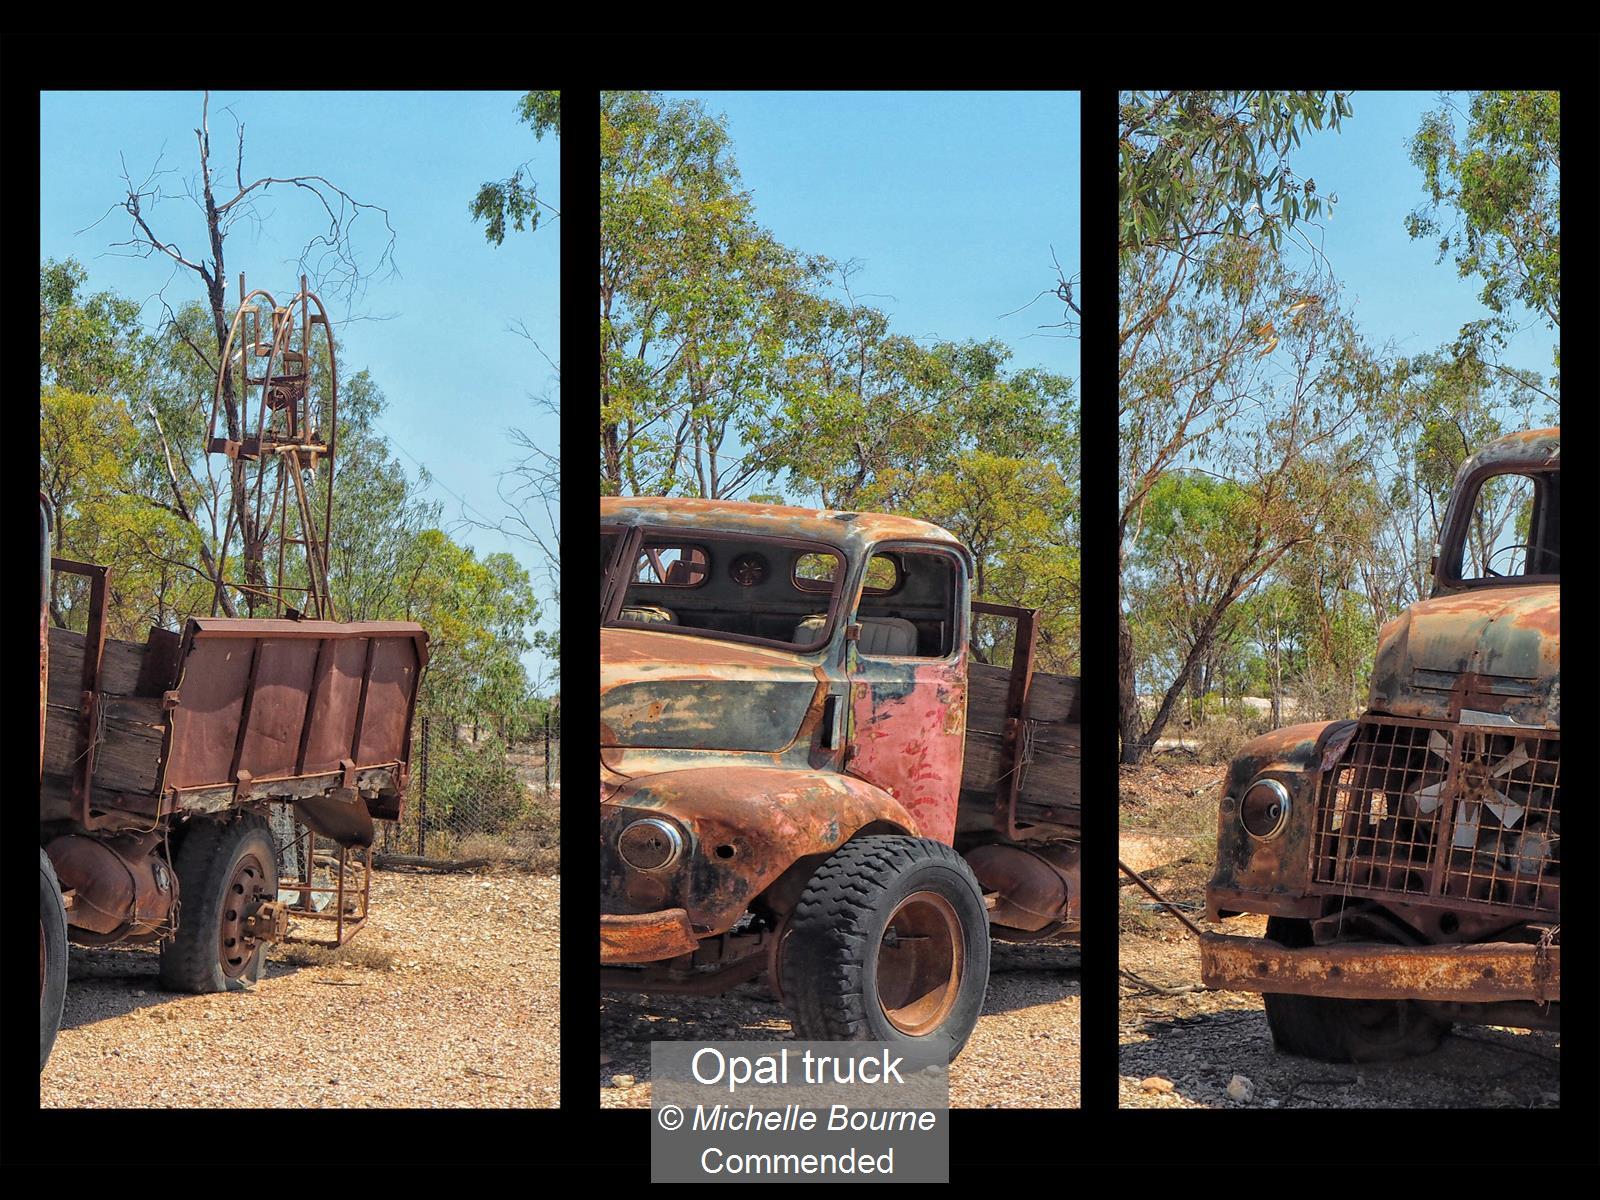 Opal truck_Michelle Bourne_Comm